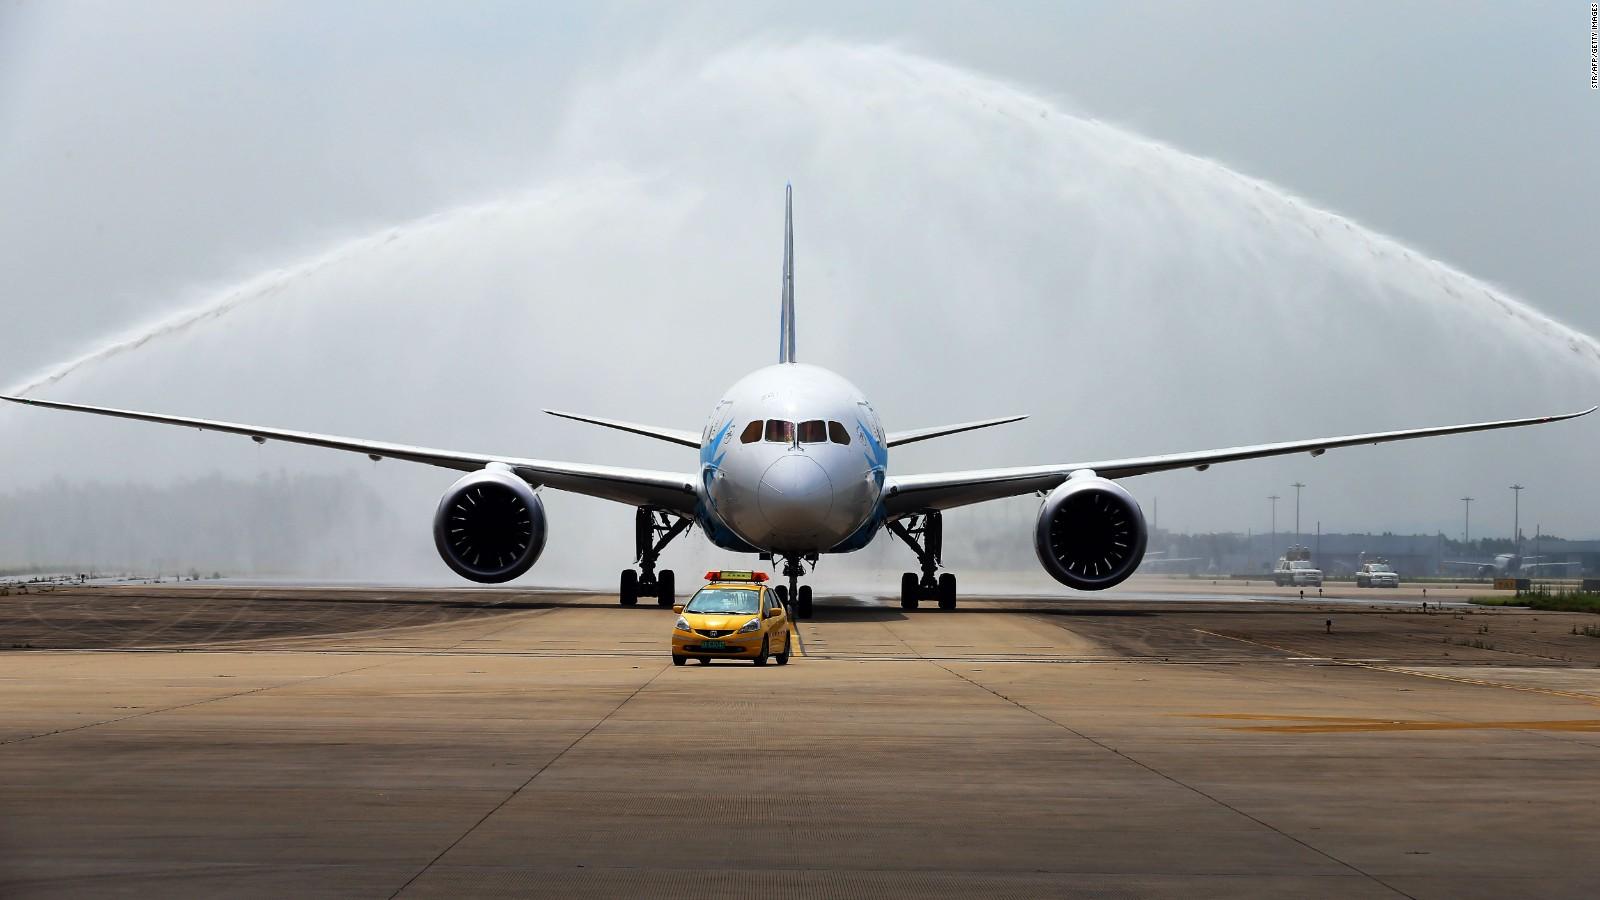 faa orders urgent engine fix for boeing 787 dreamliners cnncom - Boeing Aerospace Engineer Sample Resume